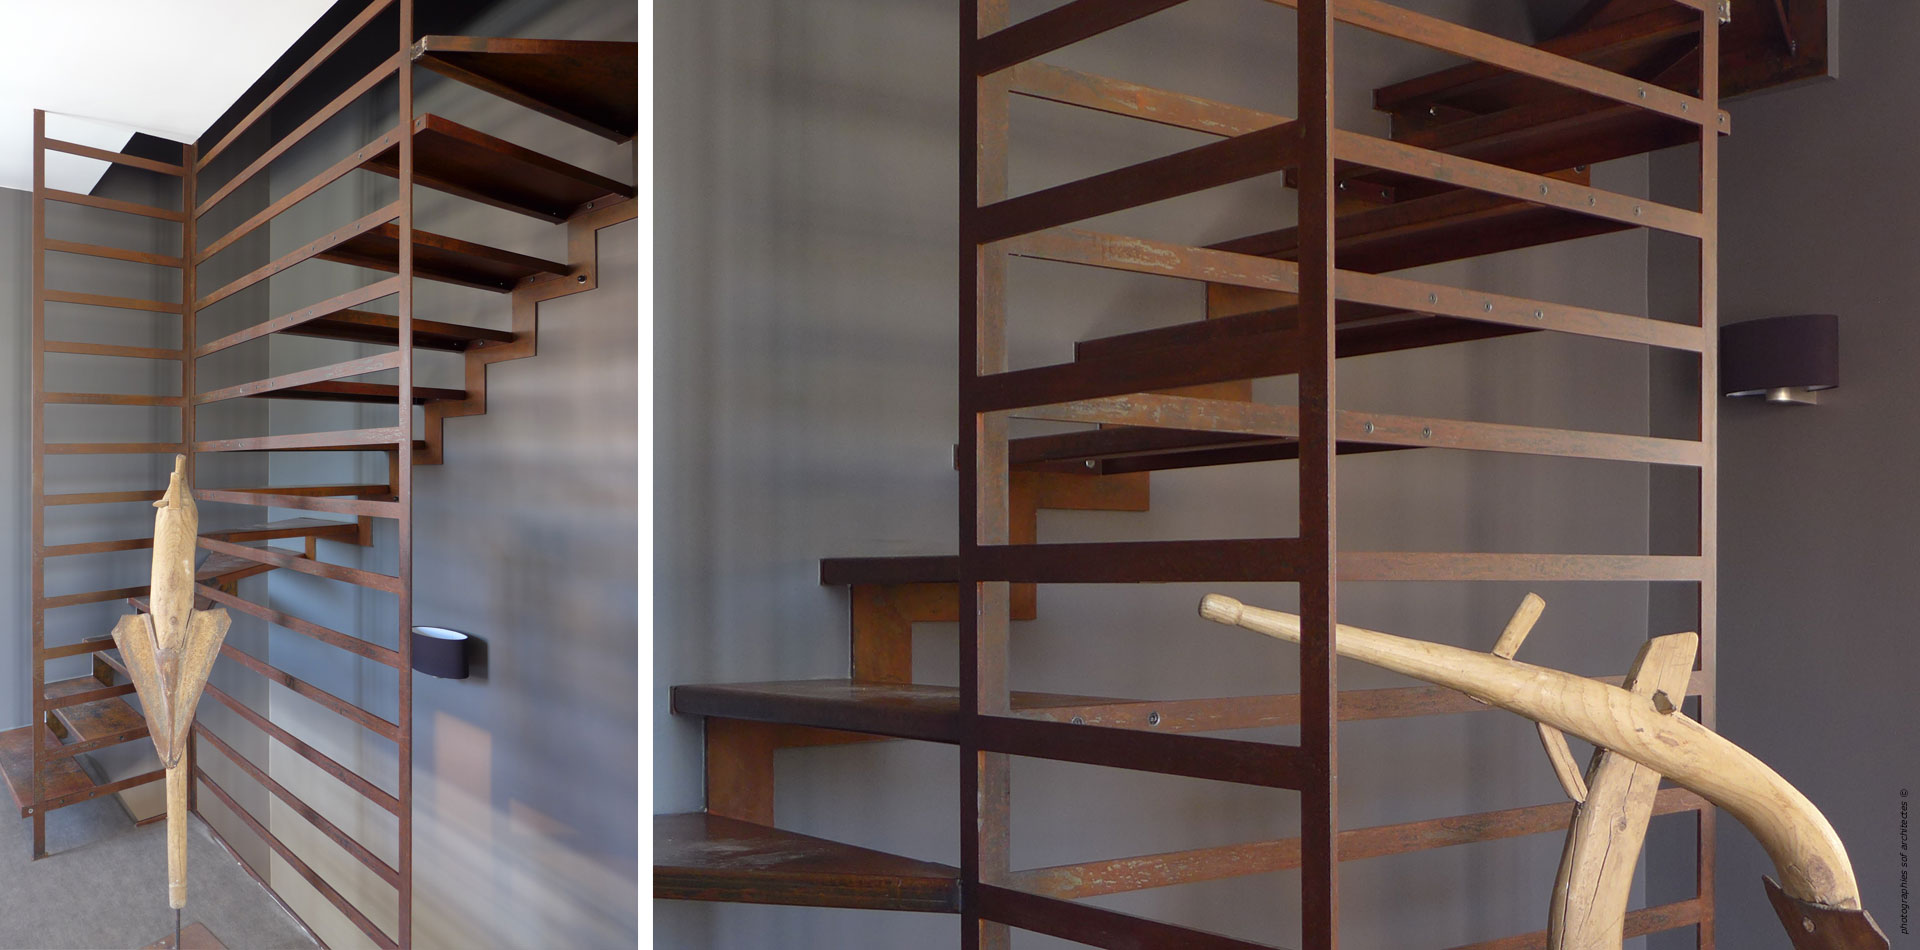 SOF Architectes  Escalier CortenSOF Architectes